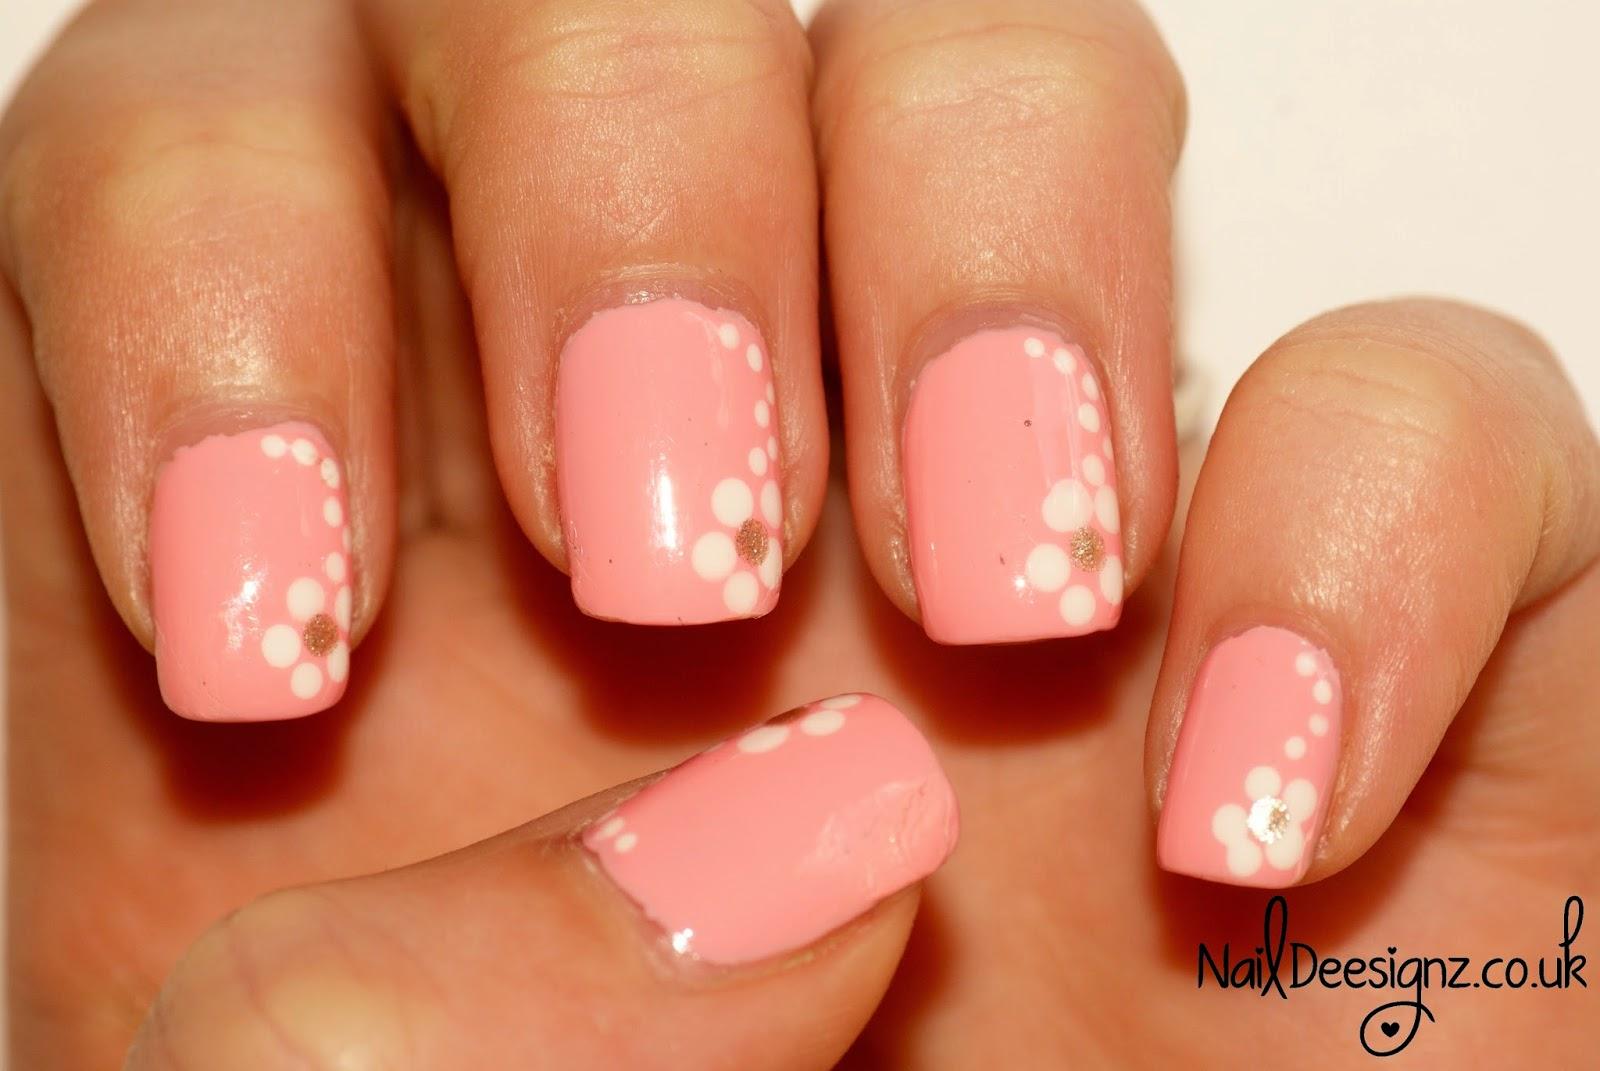 Naildeesignz Spring Flower Nail Art